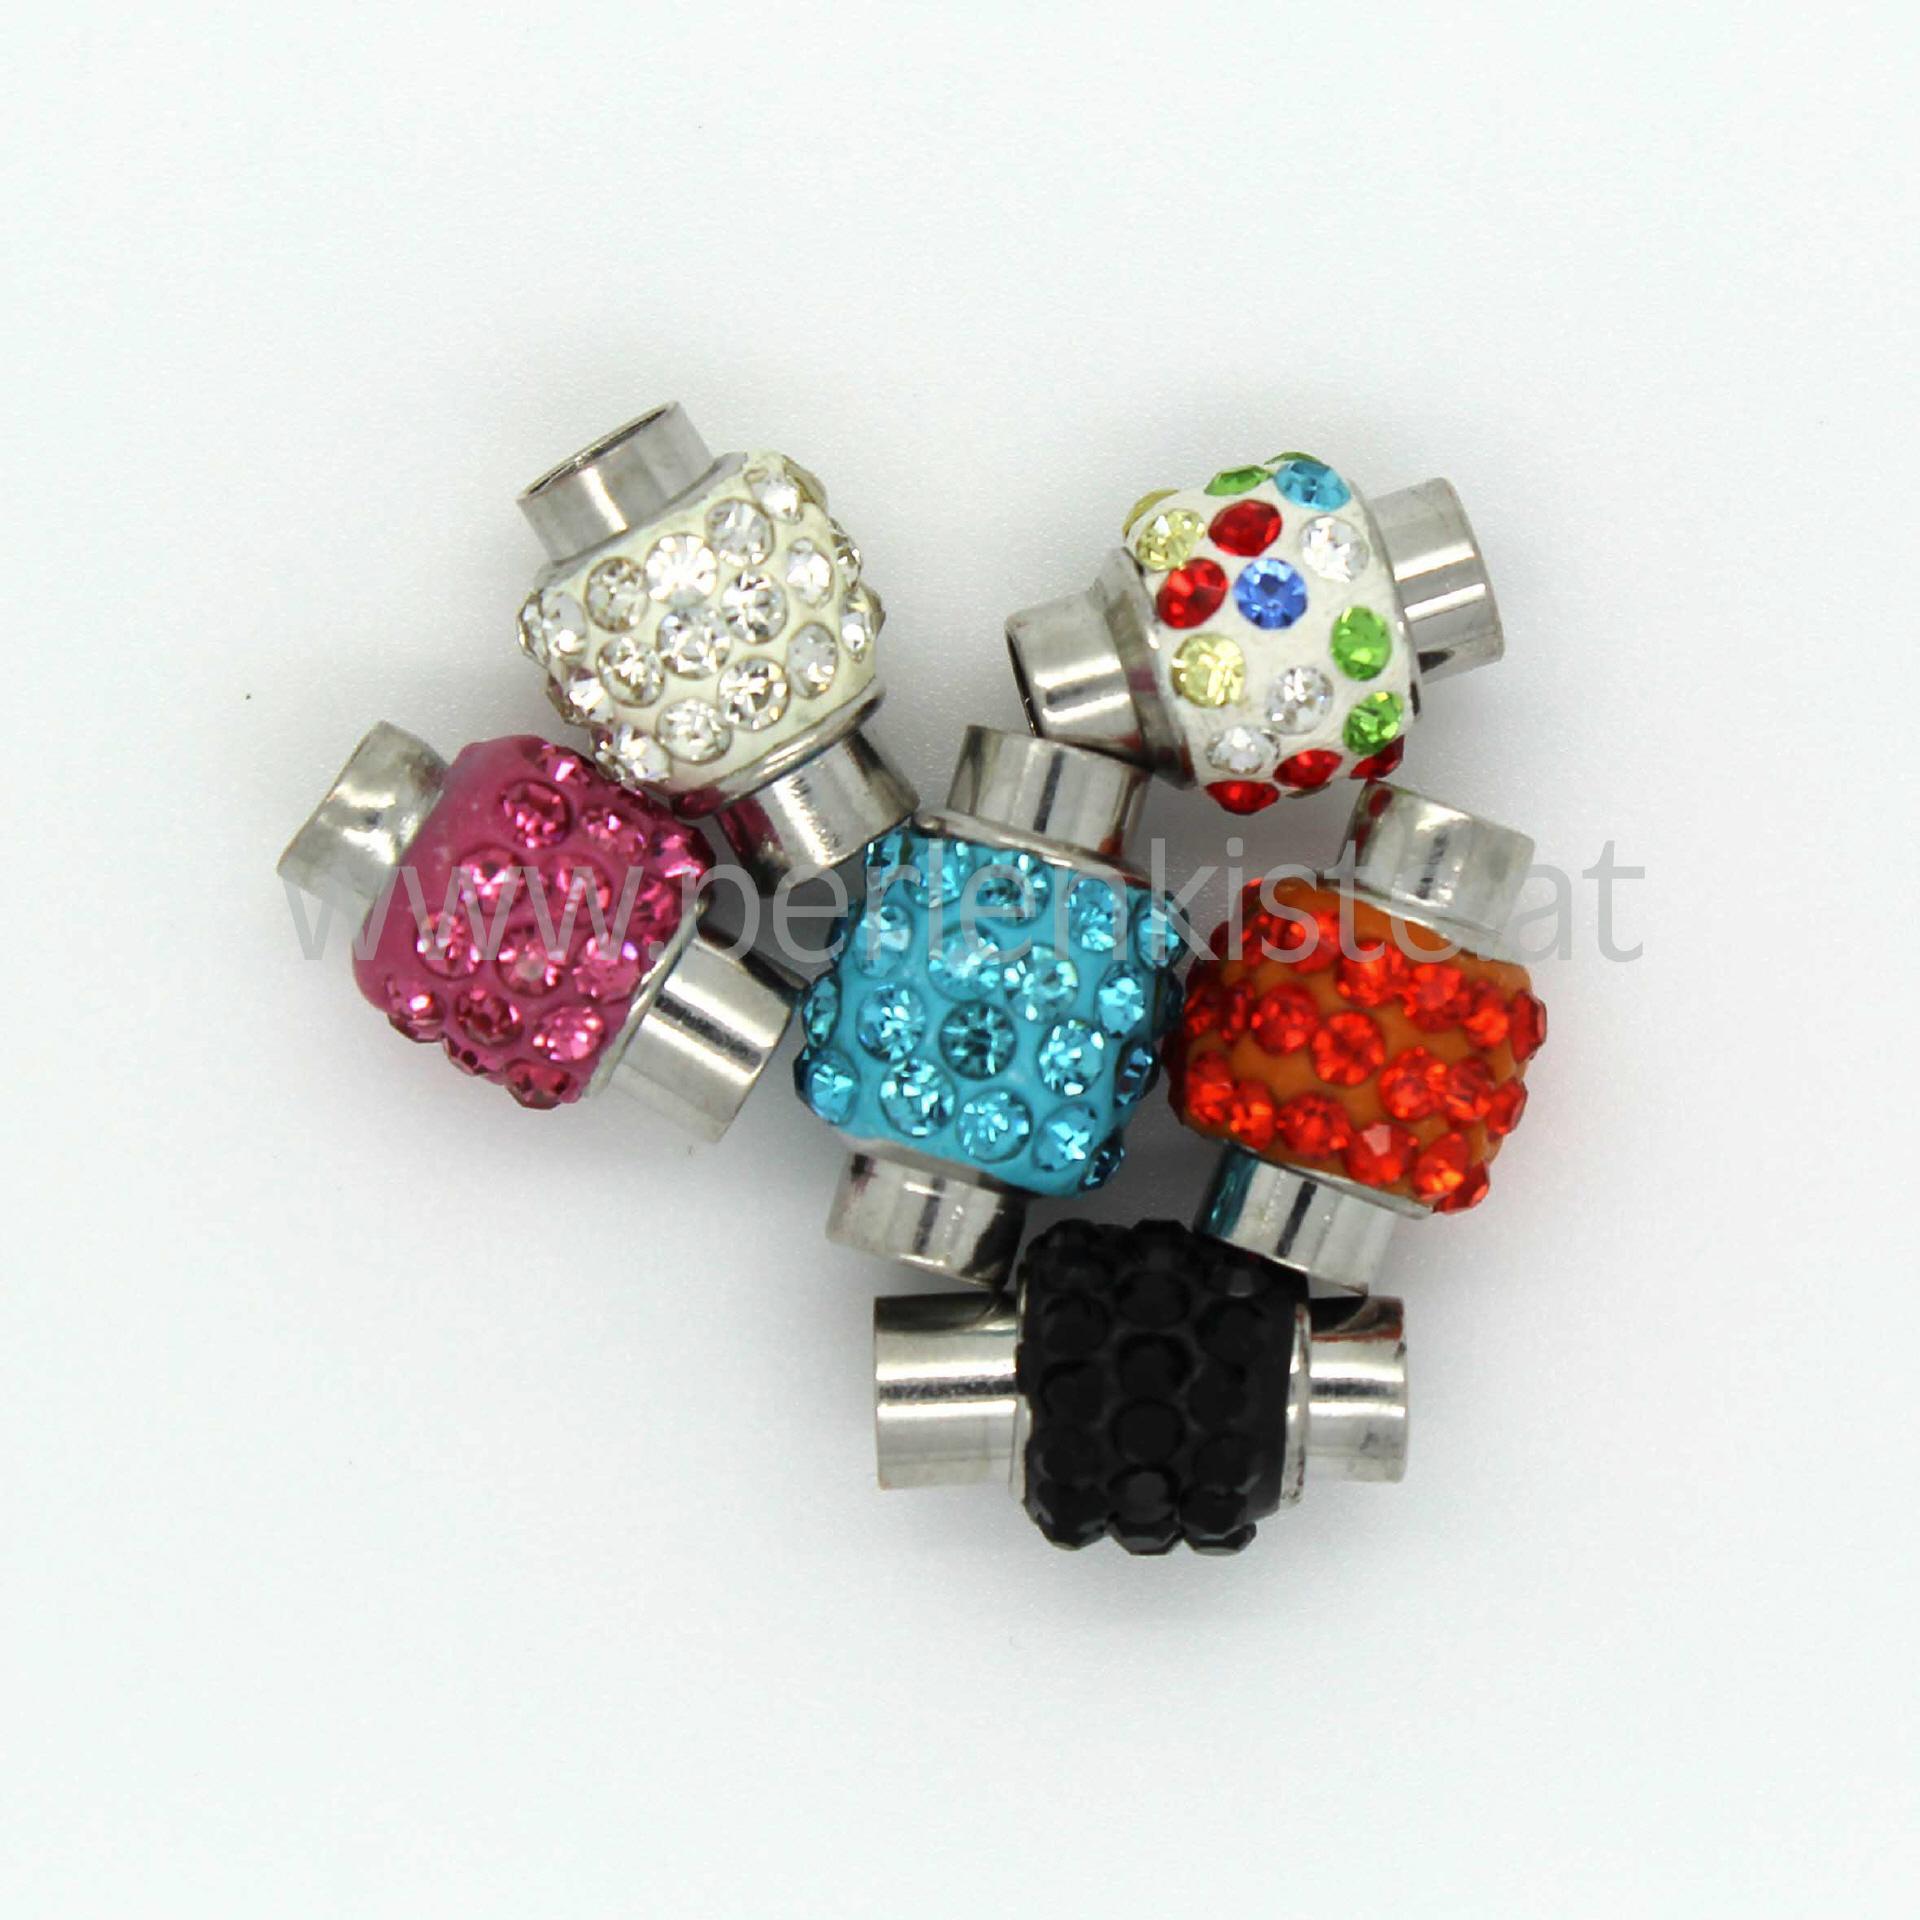 magnet steckverschluss 5 mm mit kristall. Black Bedroom Furniture Sets. Home Design Ideas